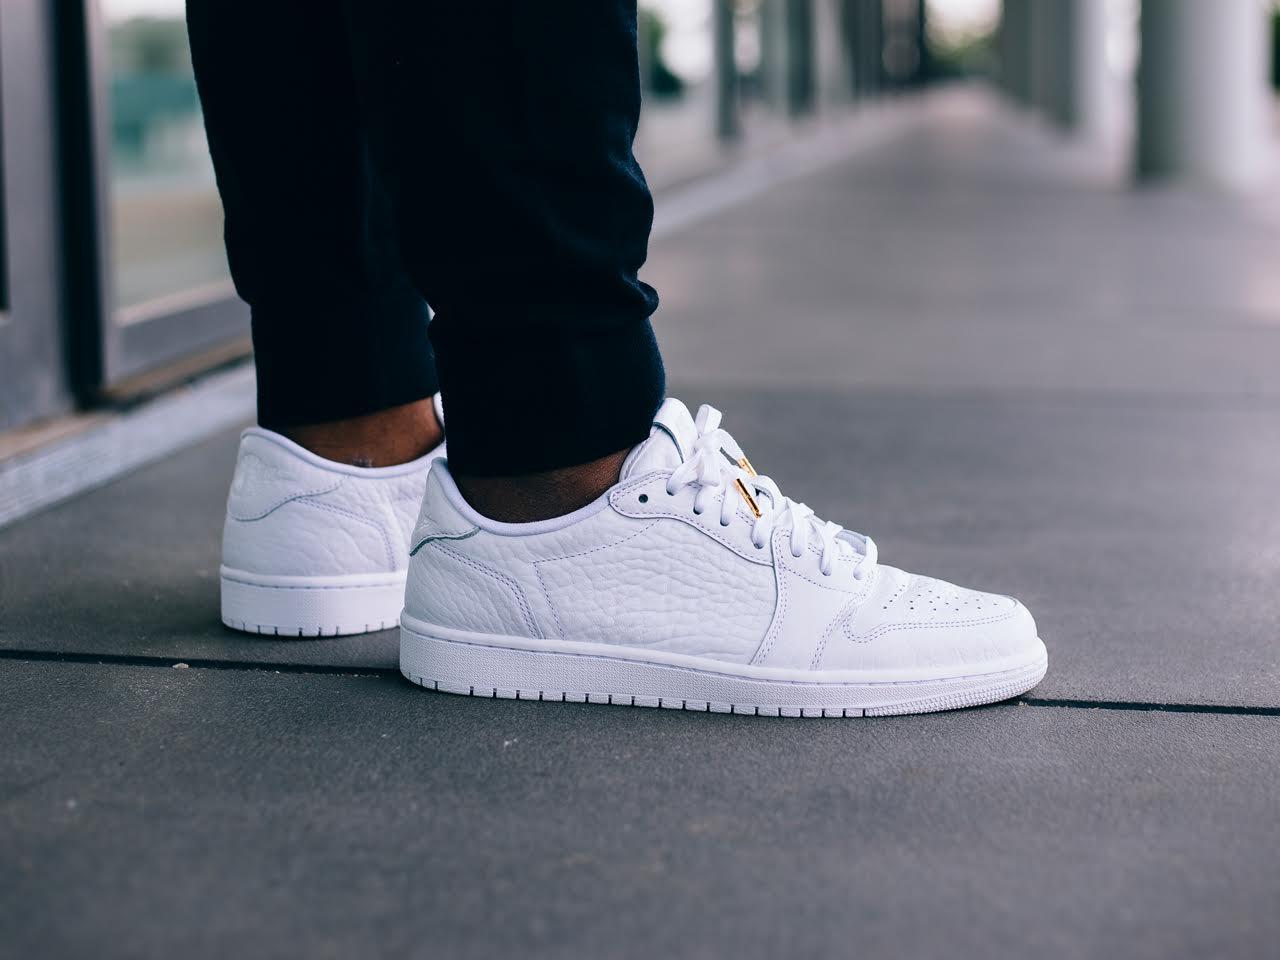 air jordan 1 low white on feet